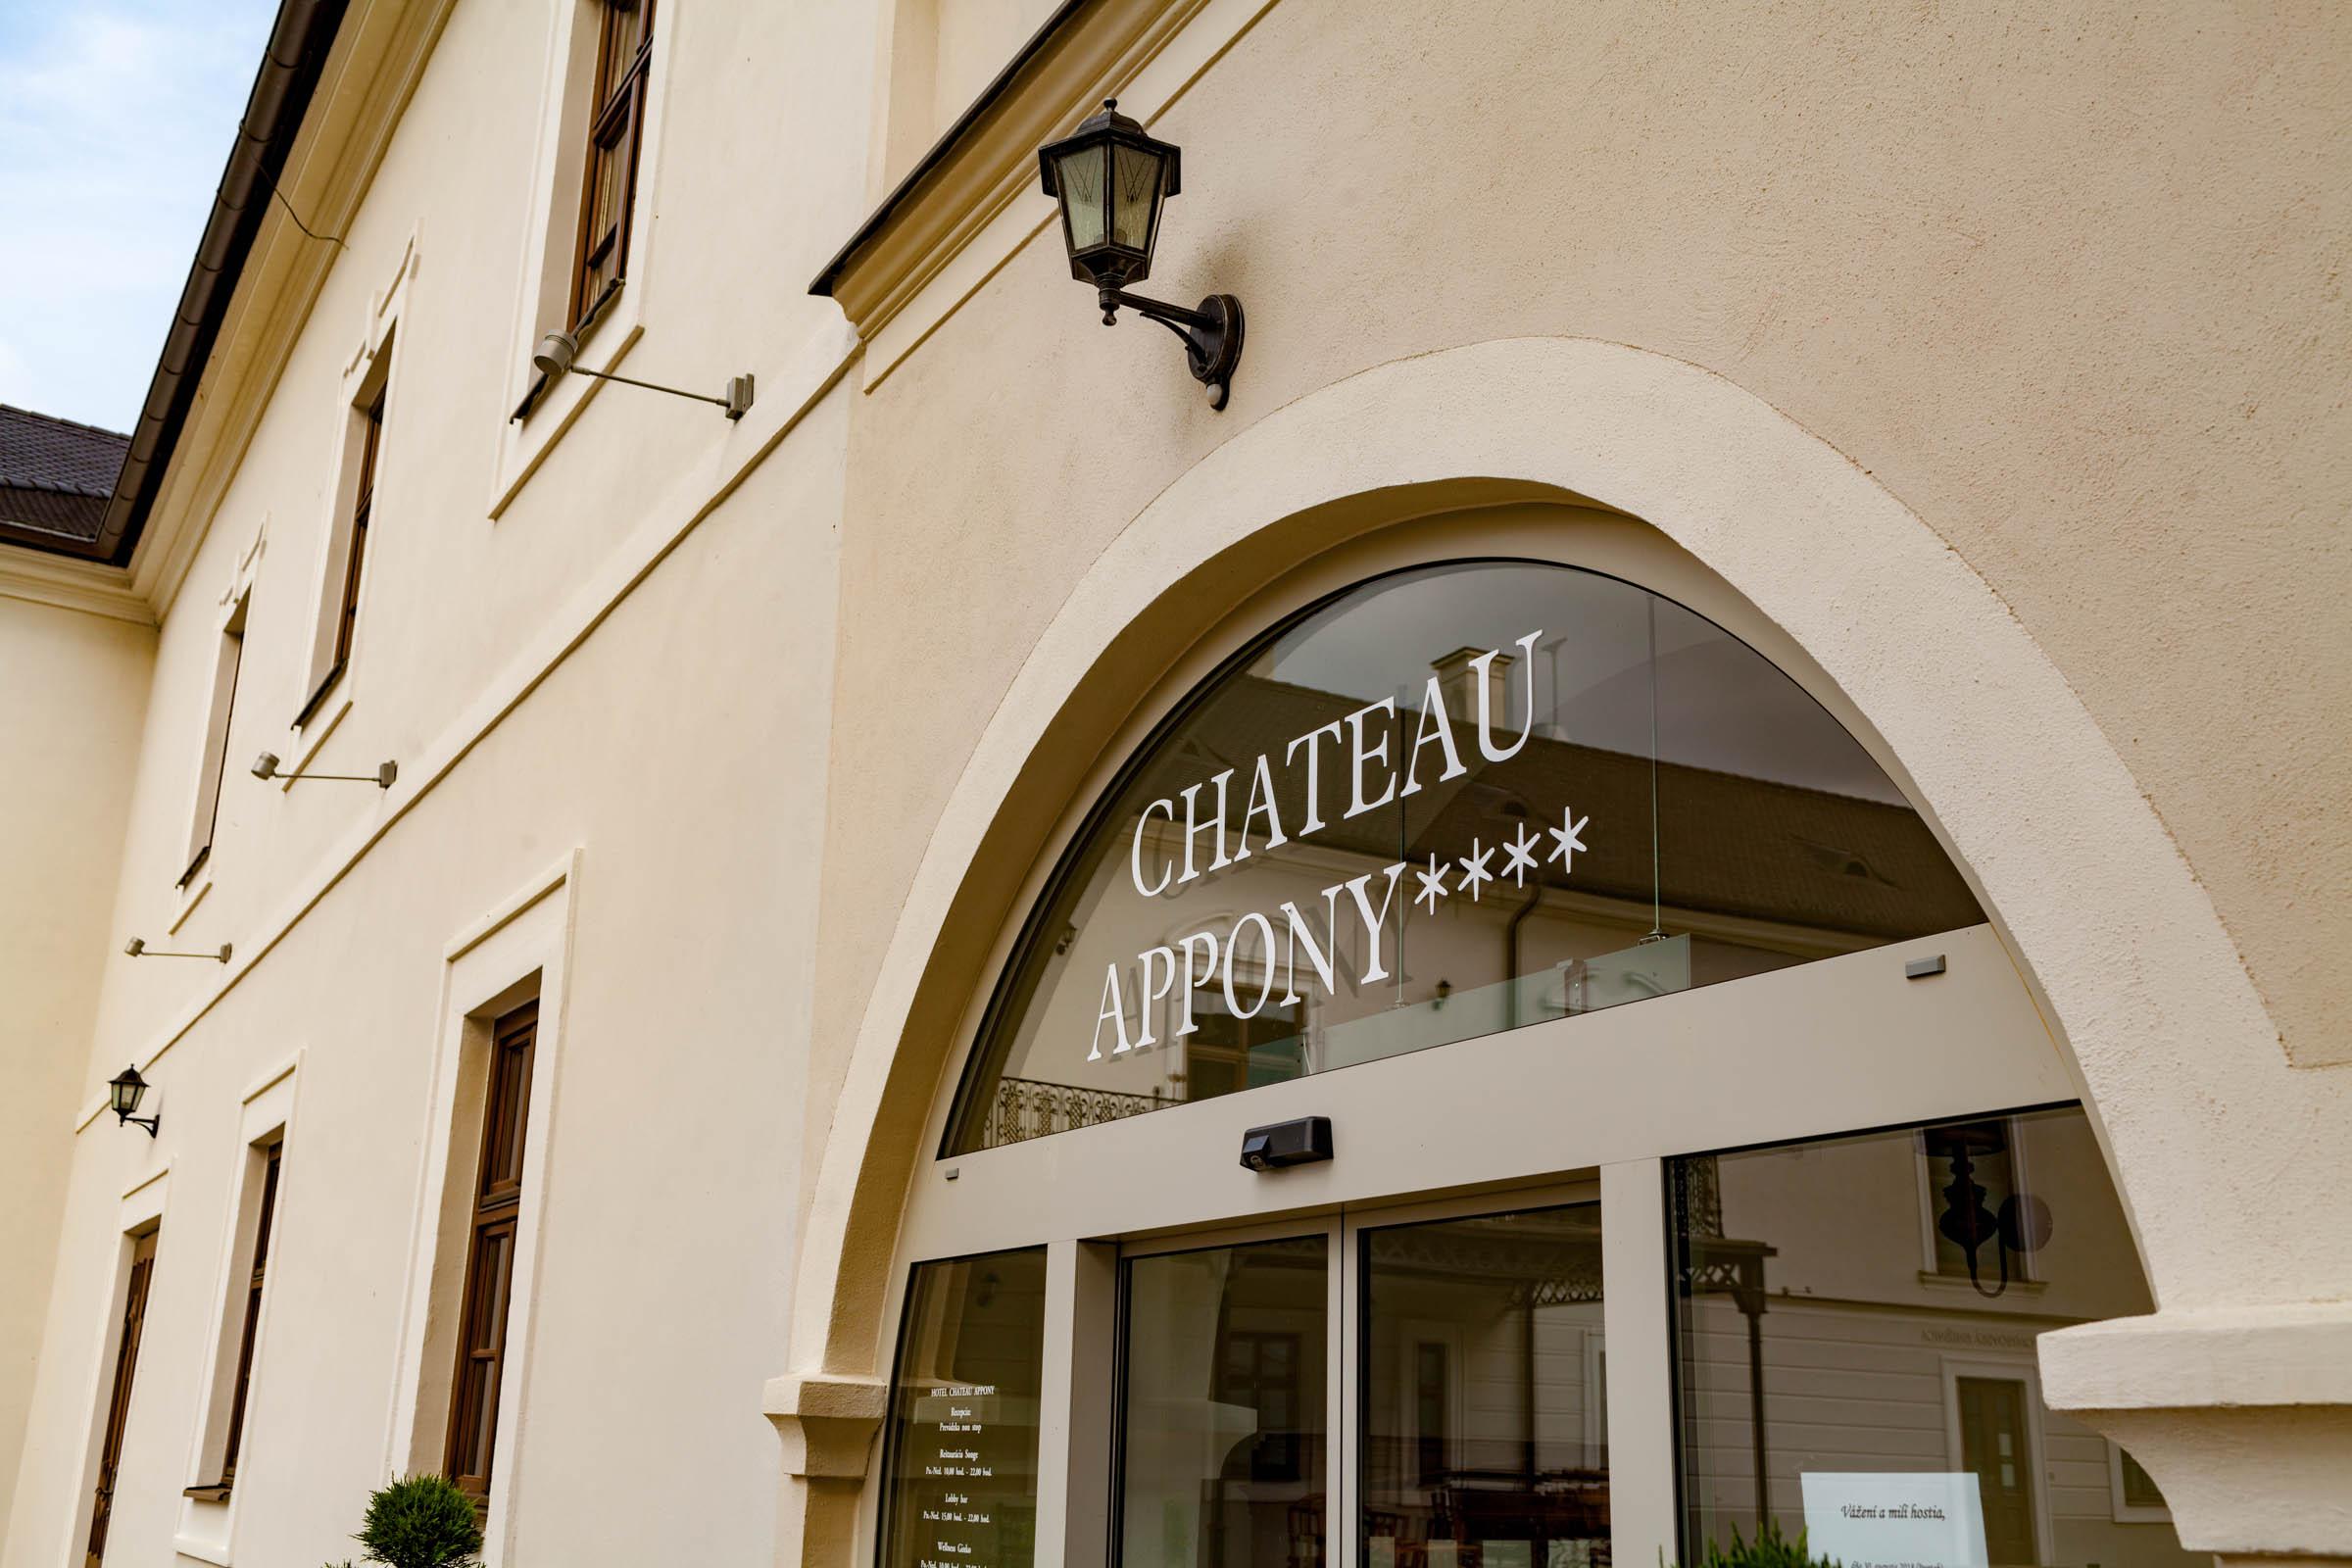 Chateau Appony-42.jpg